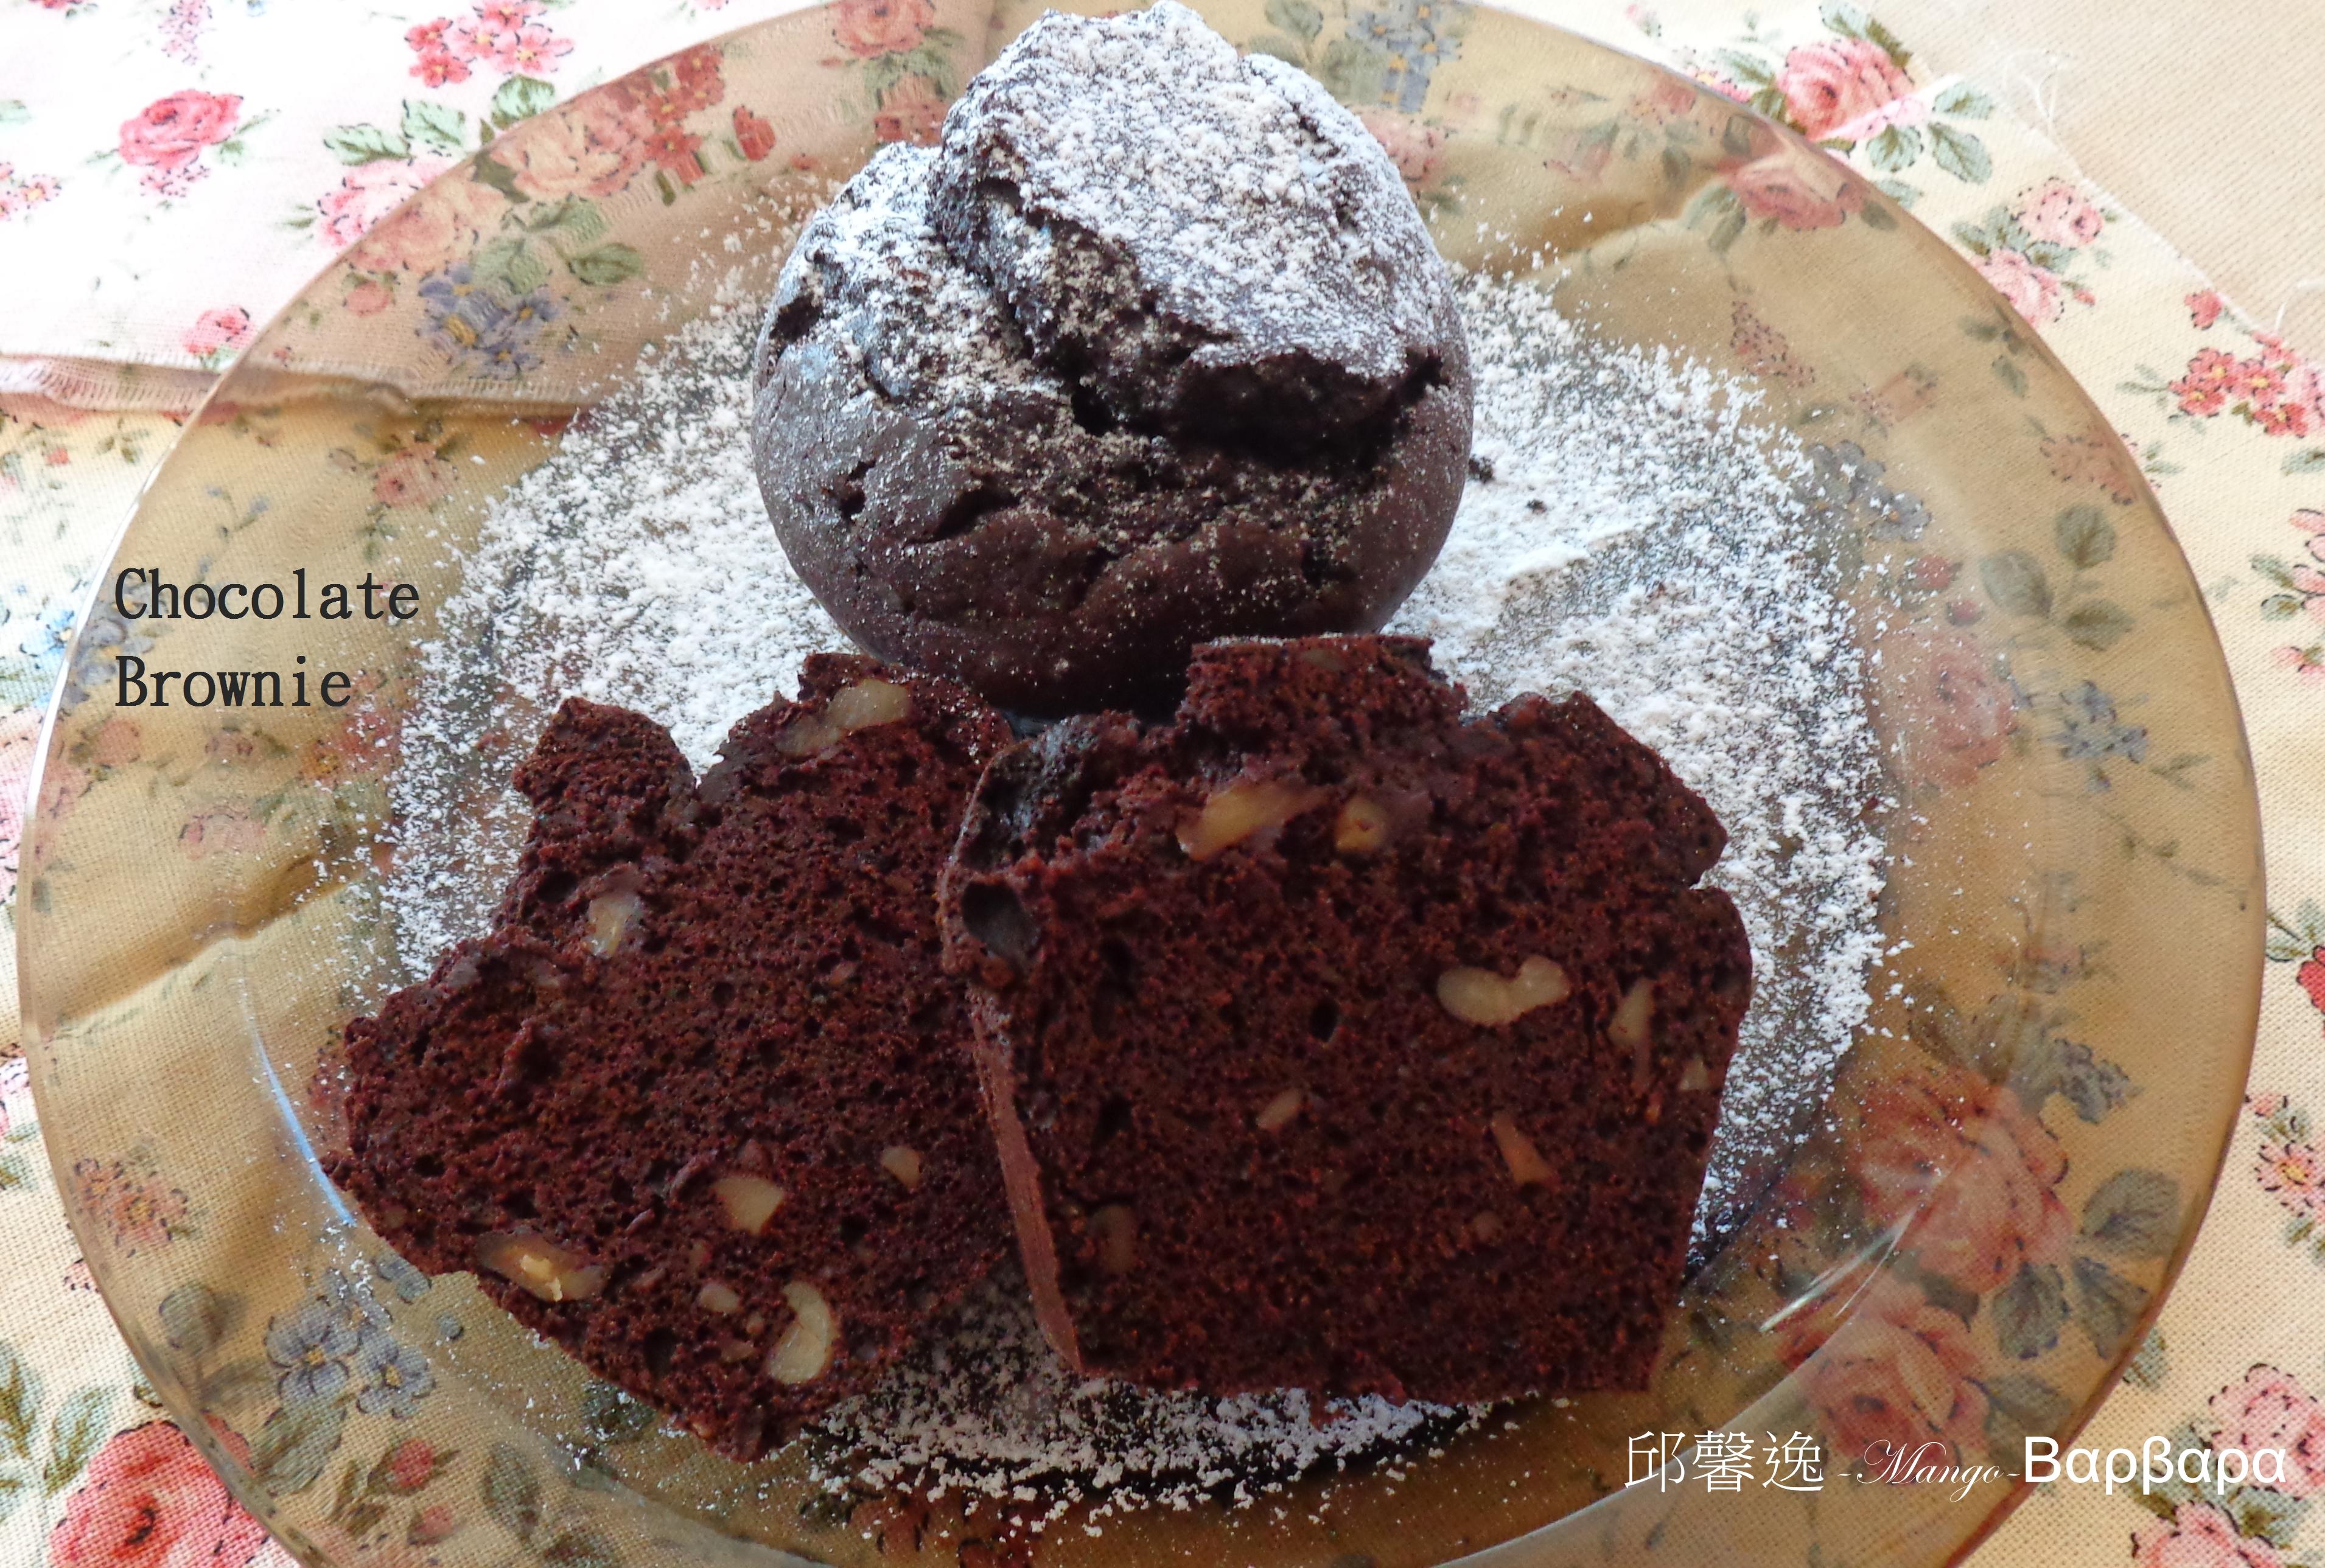 Chocolate Brownie 布朗尼